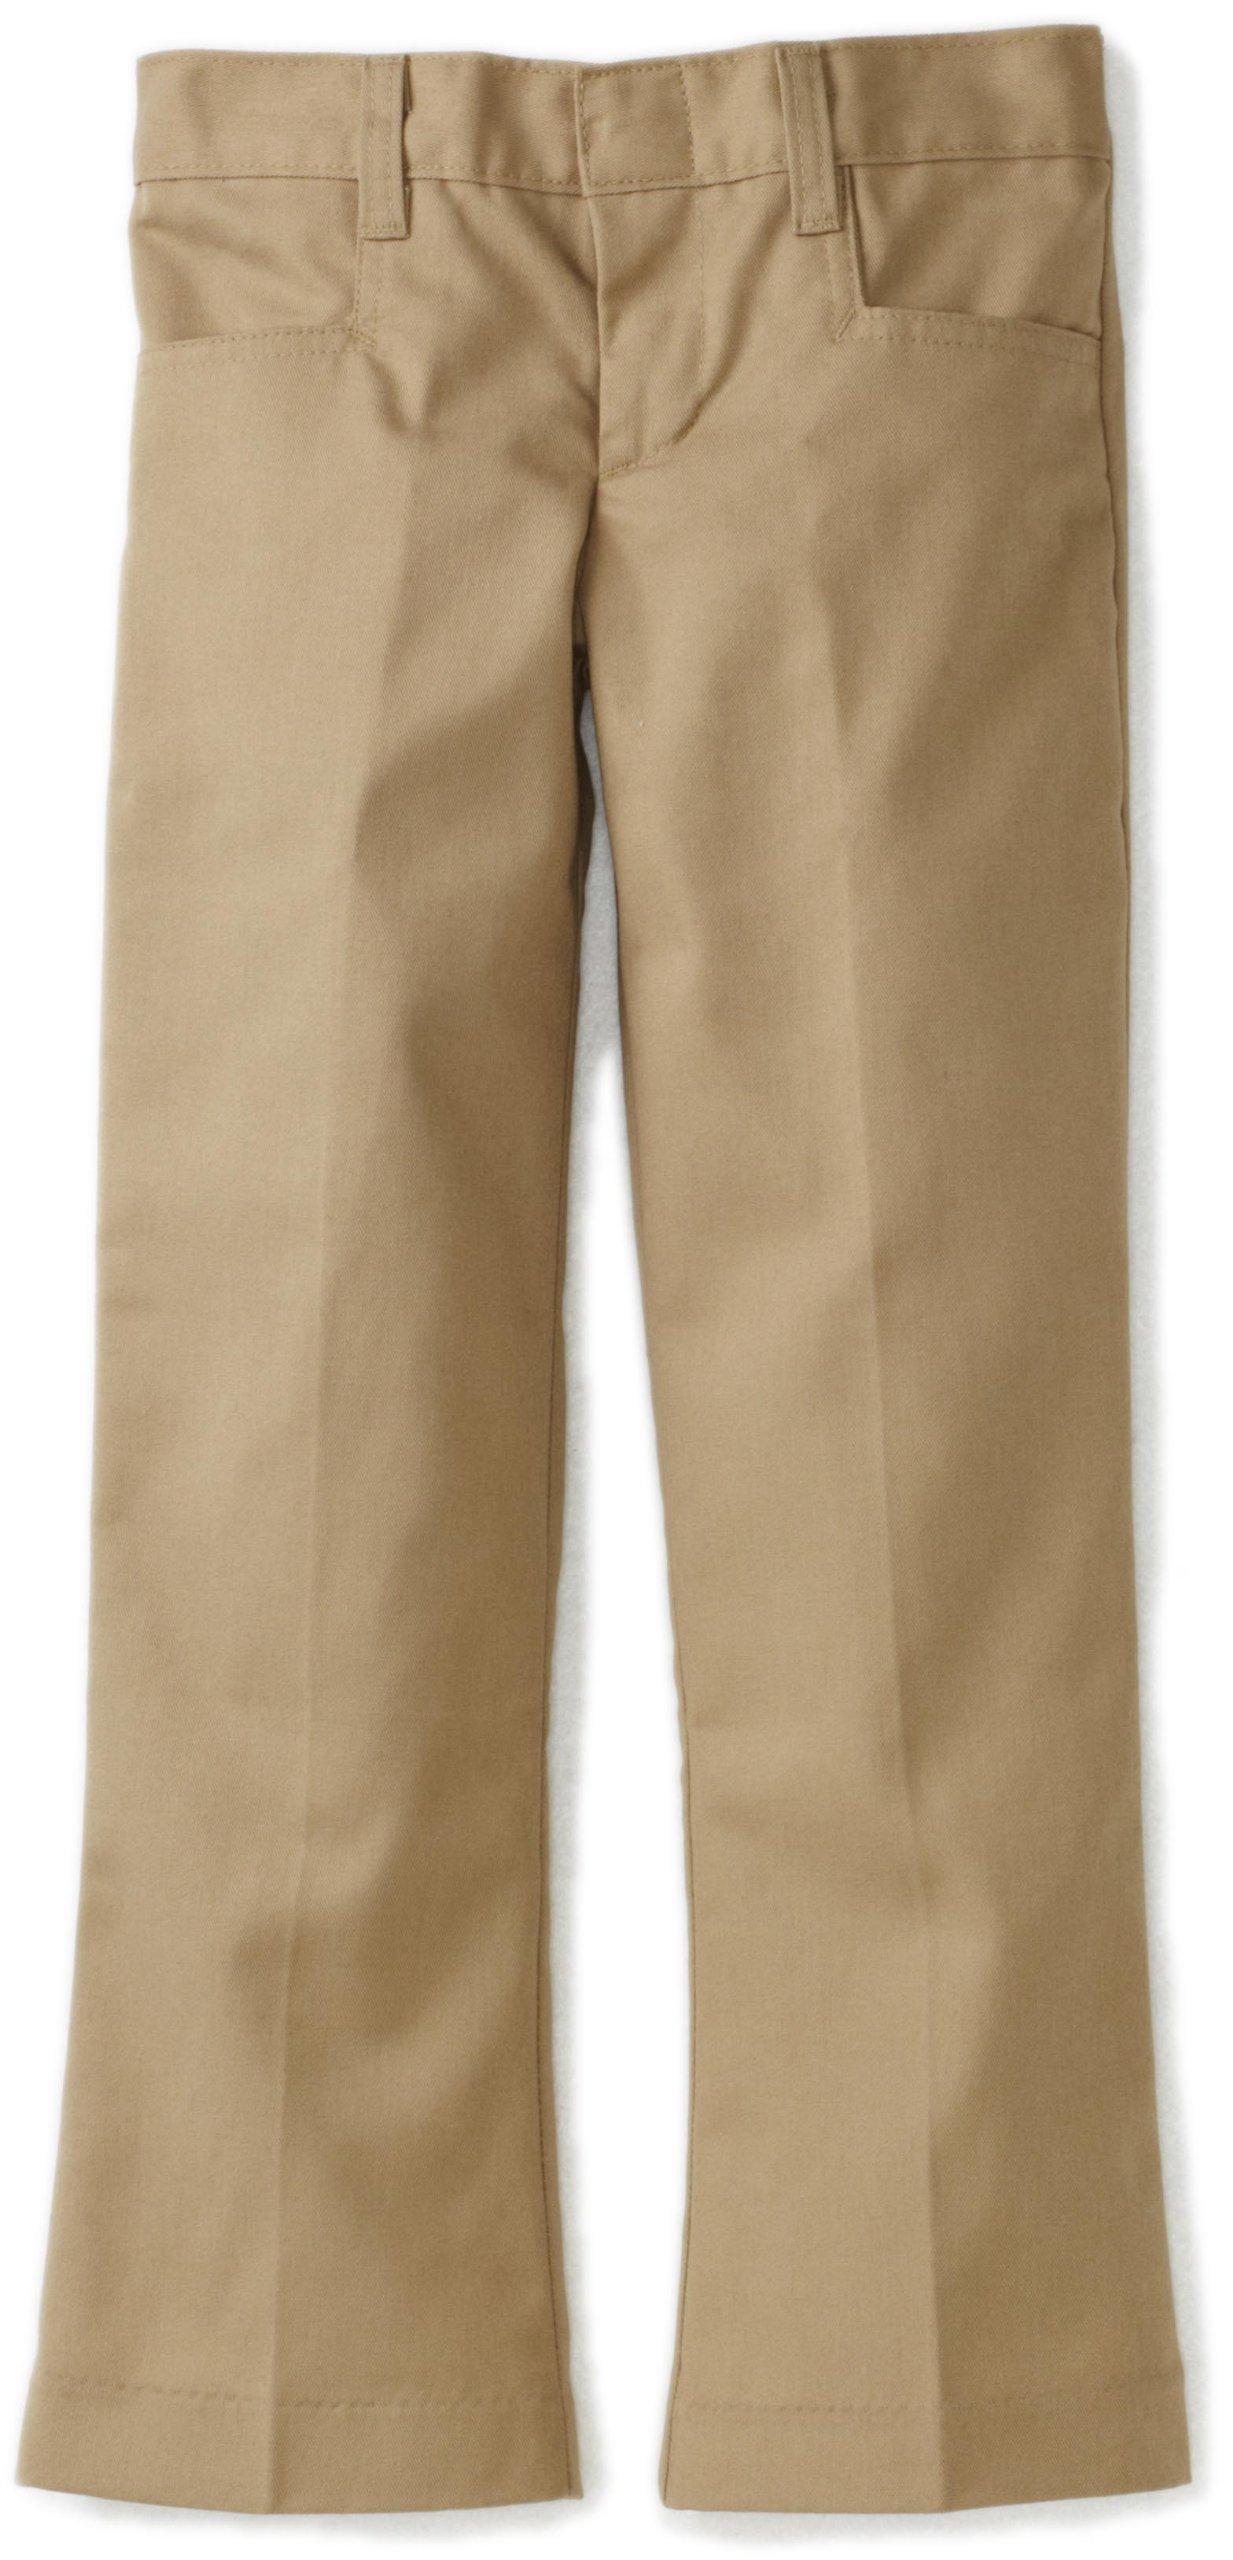 Dickies Little Girls' Flare Bottom Pant, Khaki, 6x Slim